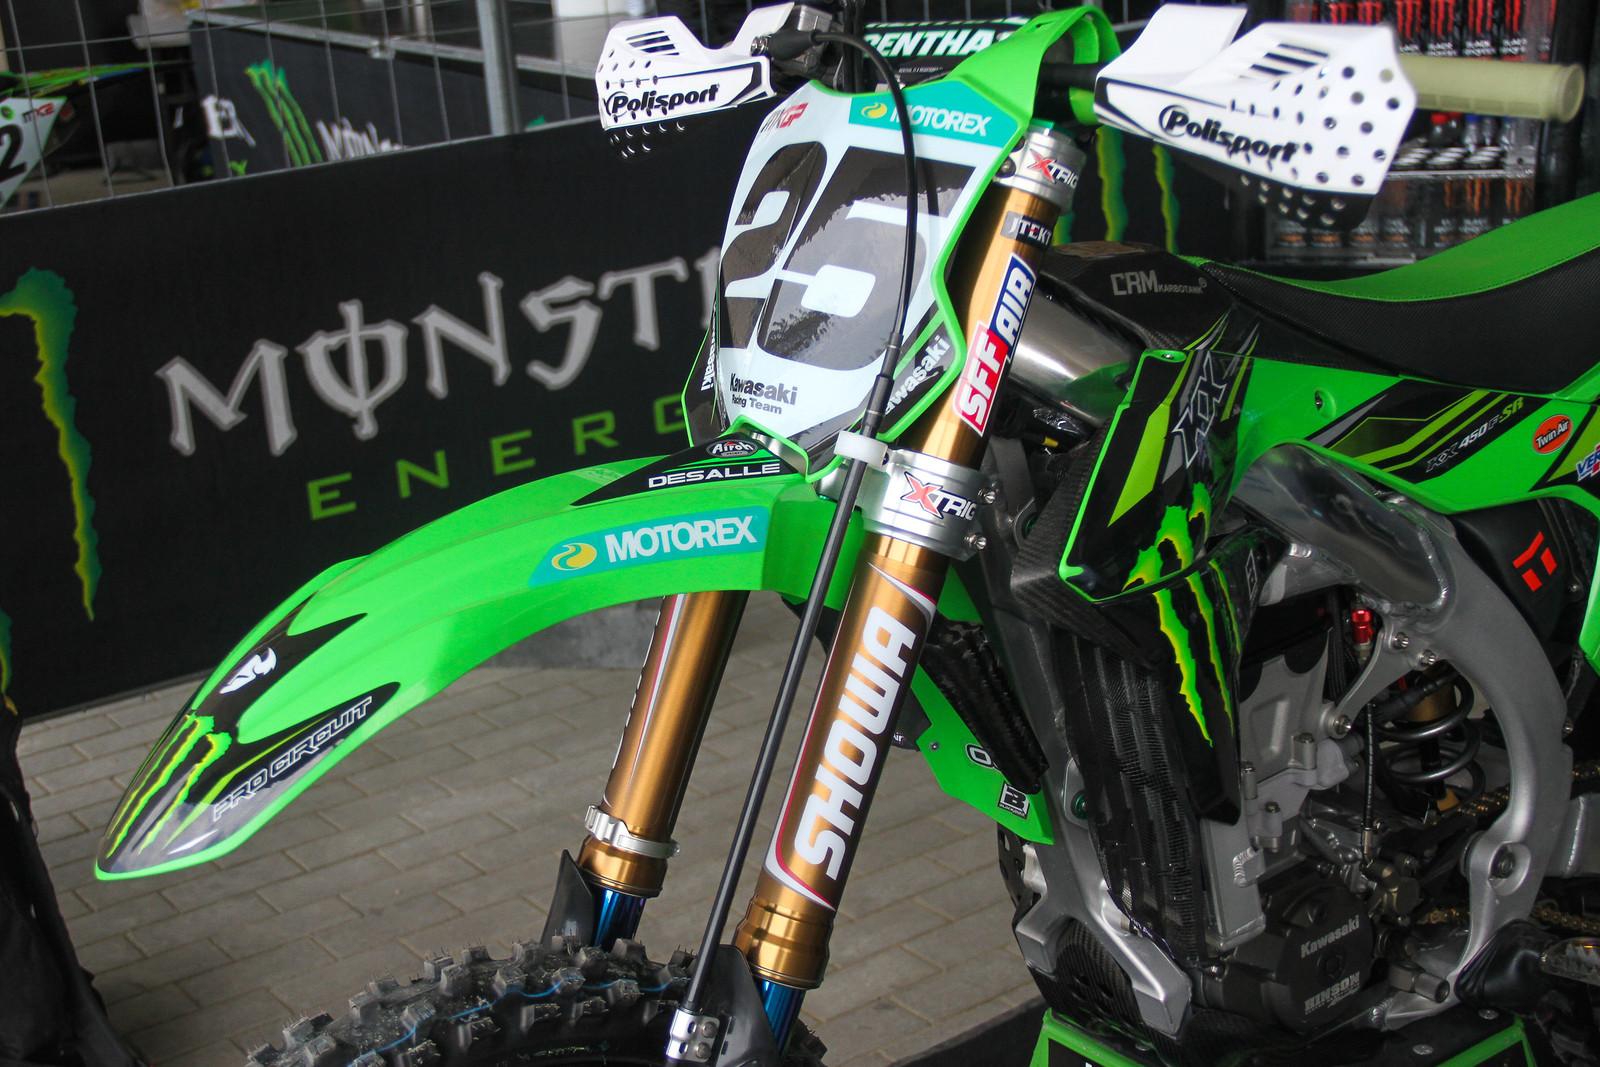 Desalle's Showa Forks - ayearinmx - Motocross Pictures - Vital MX